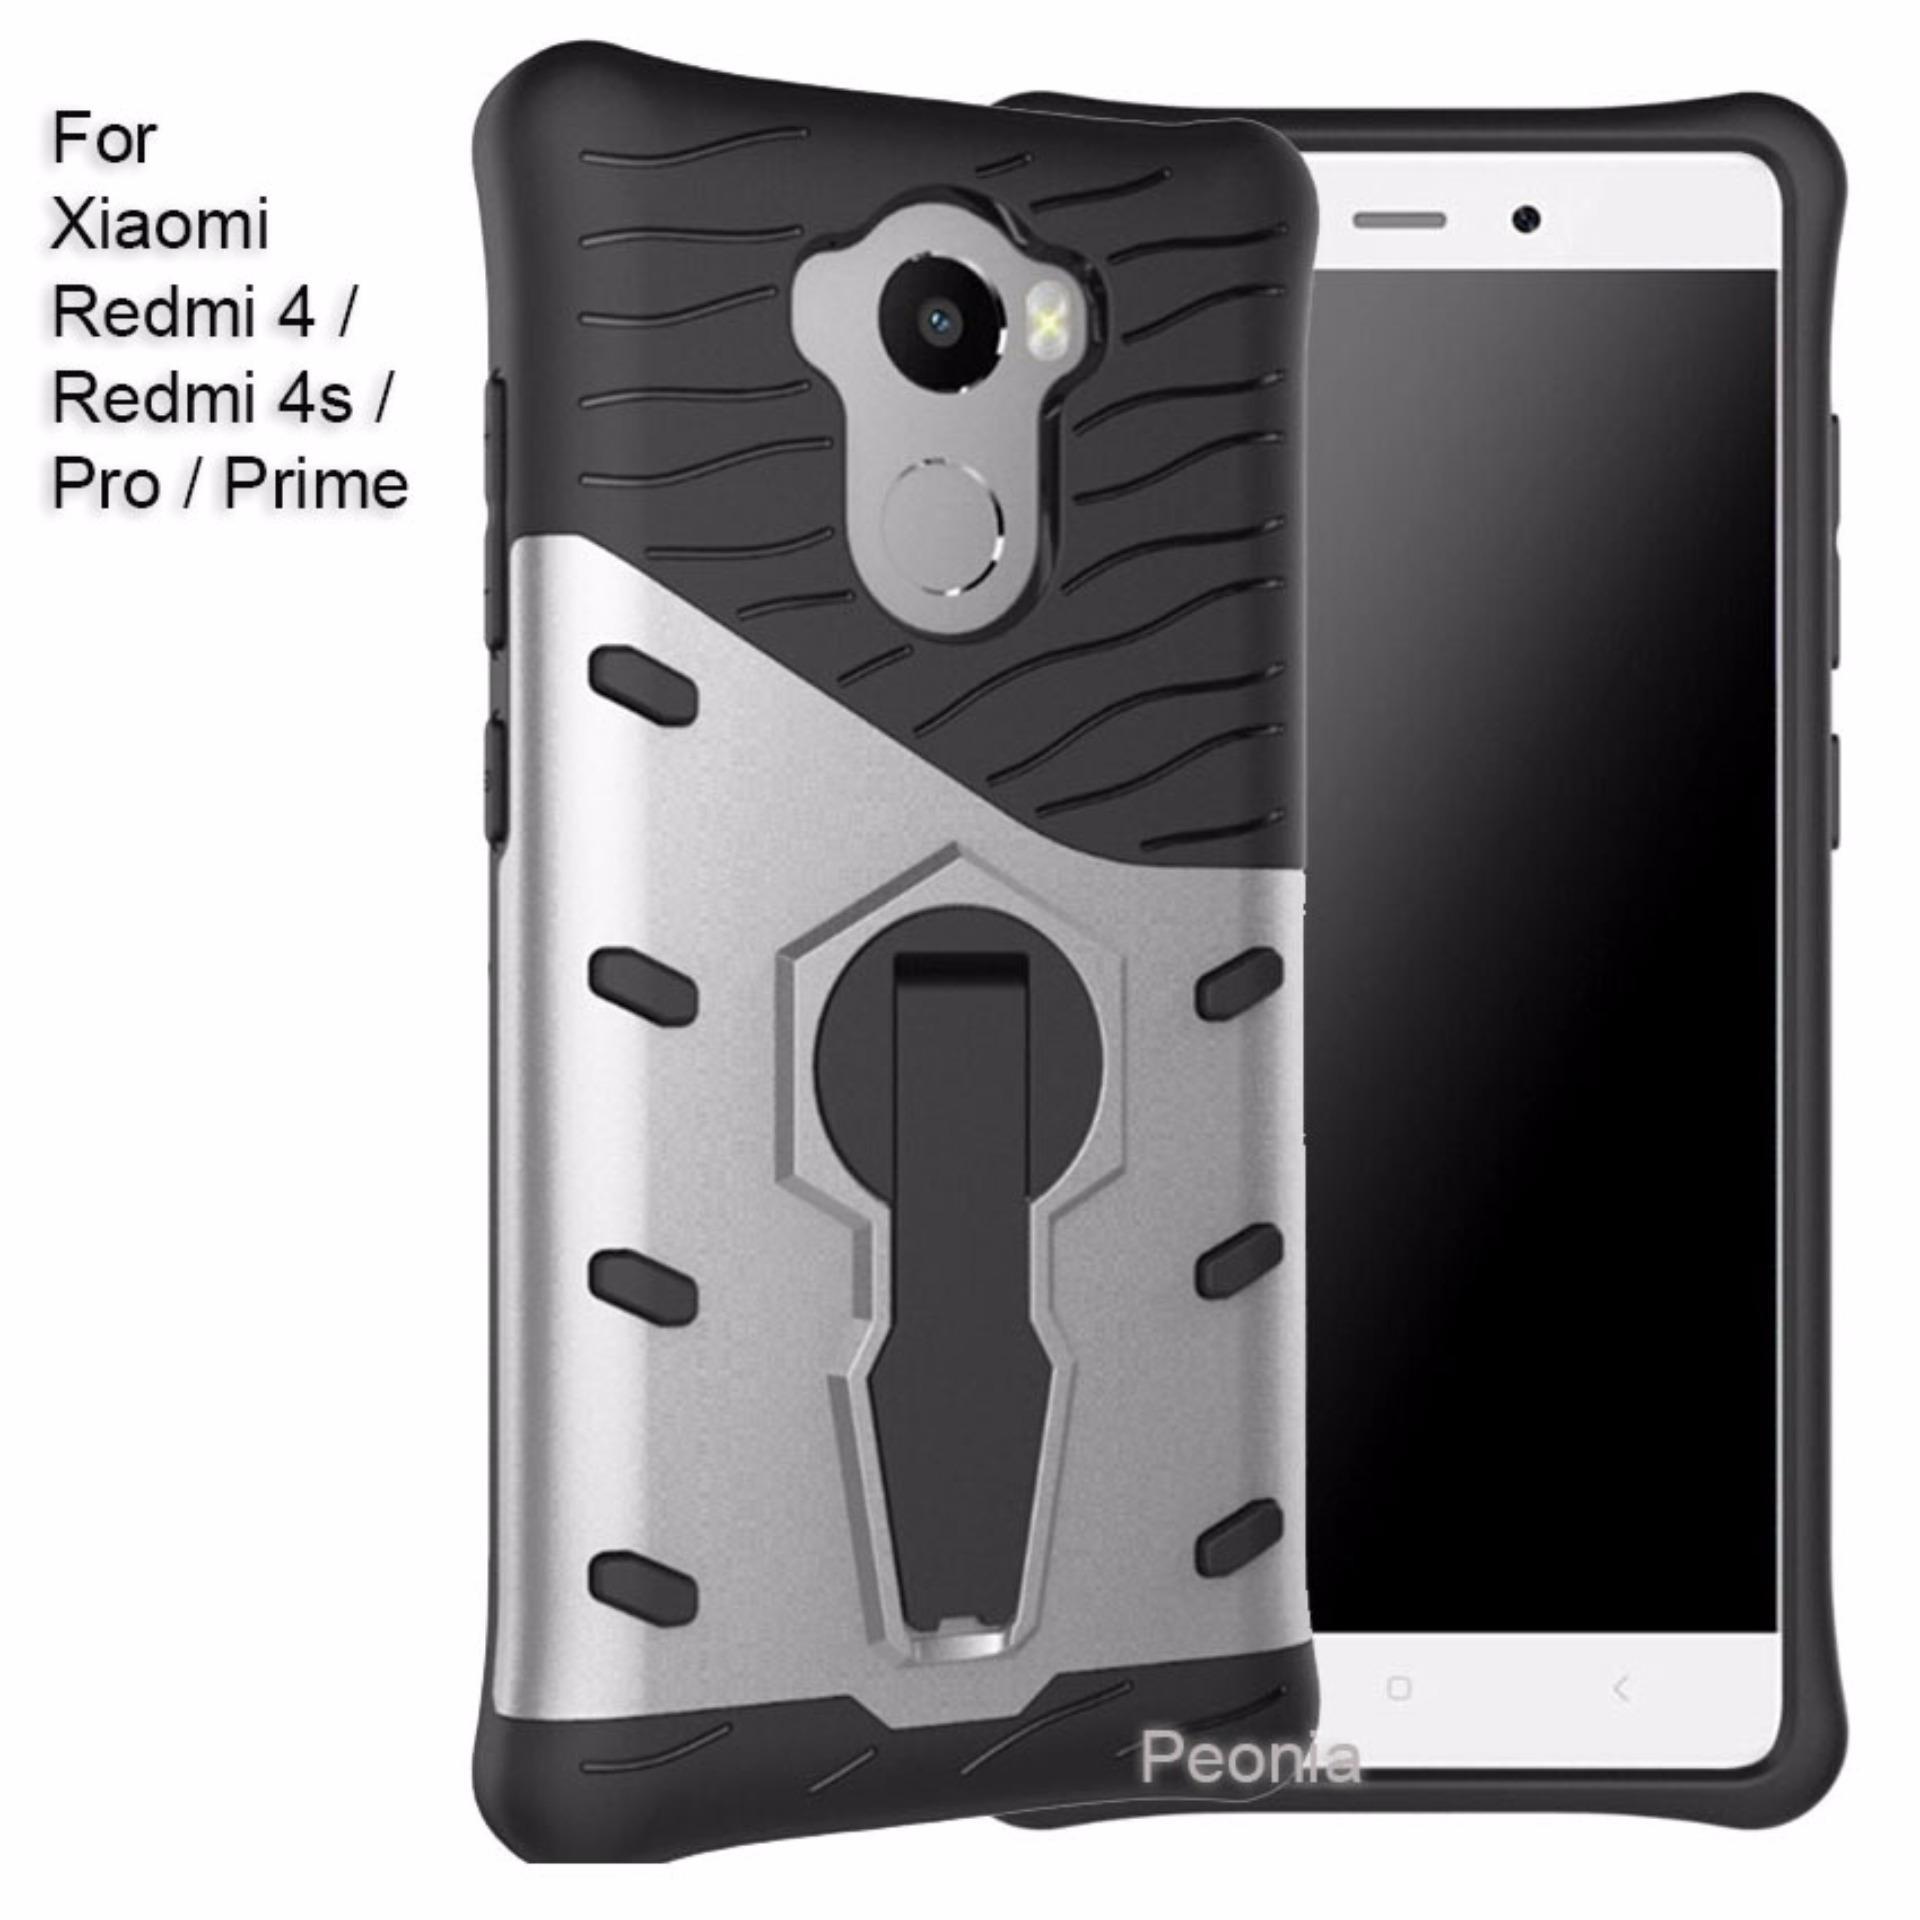 Peonia Sniper 360 Standing Rotary Slim Armor Case For Xiaomi Redmi 4 Tempered Glass Prime Pencari Harga